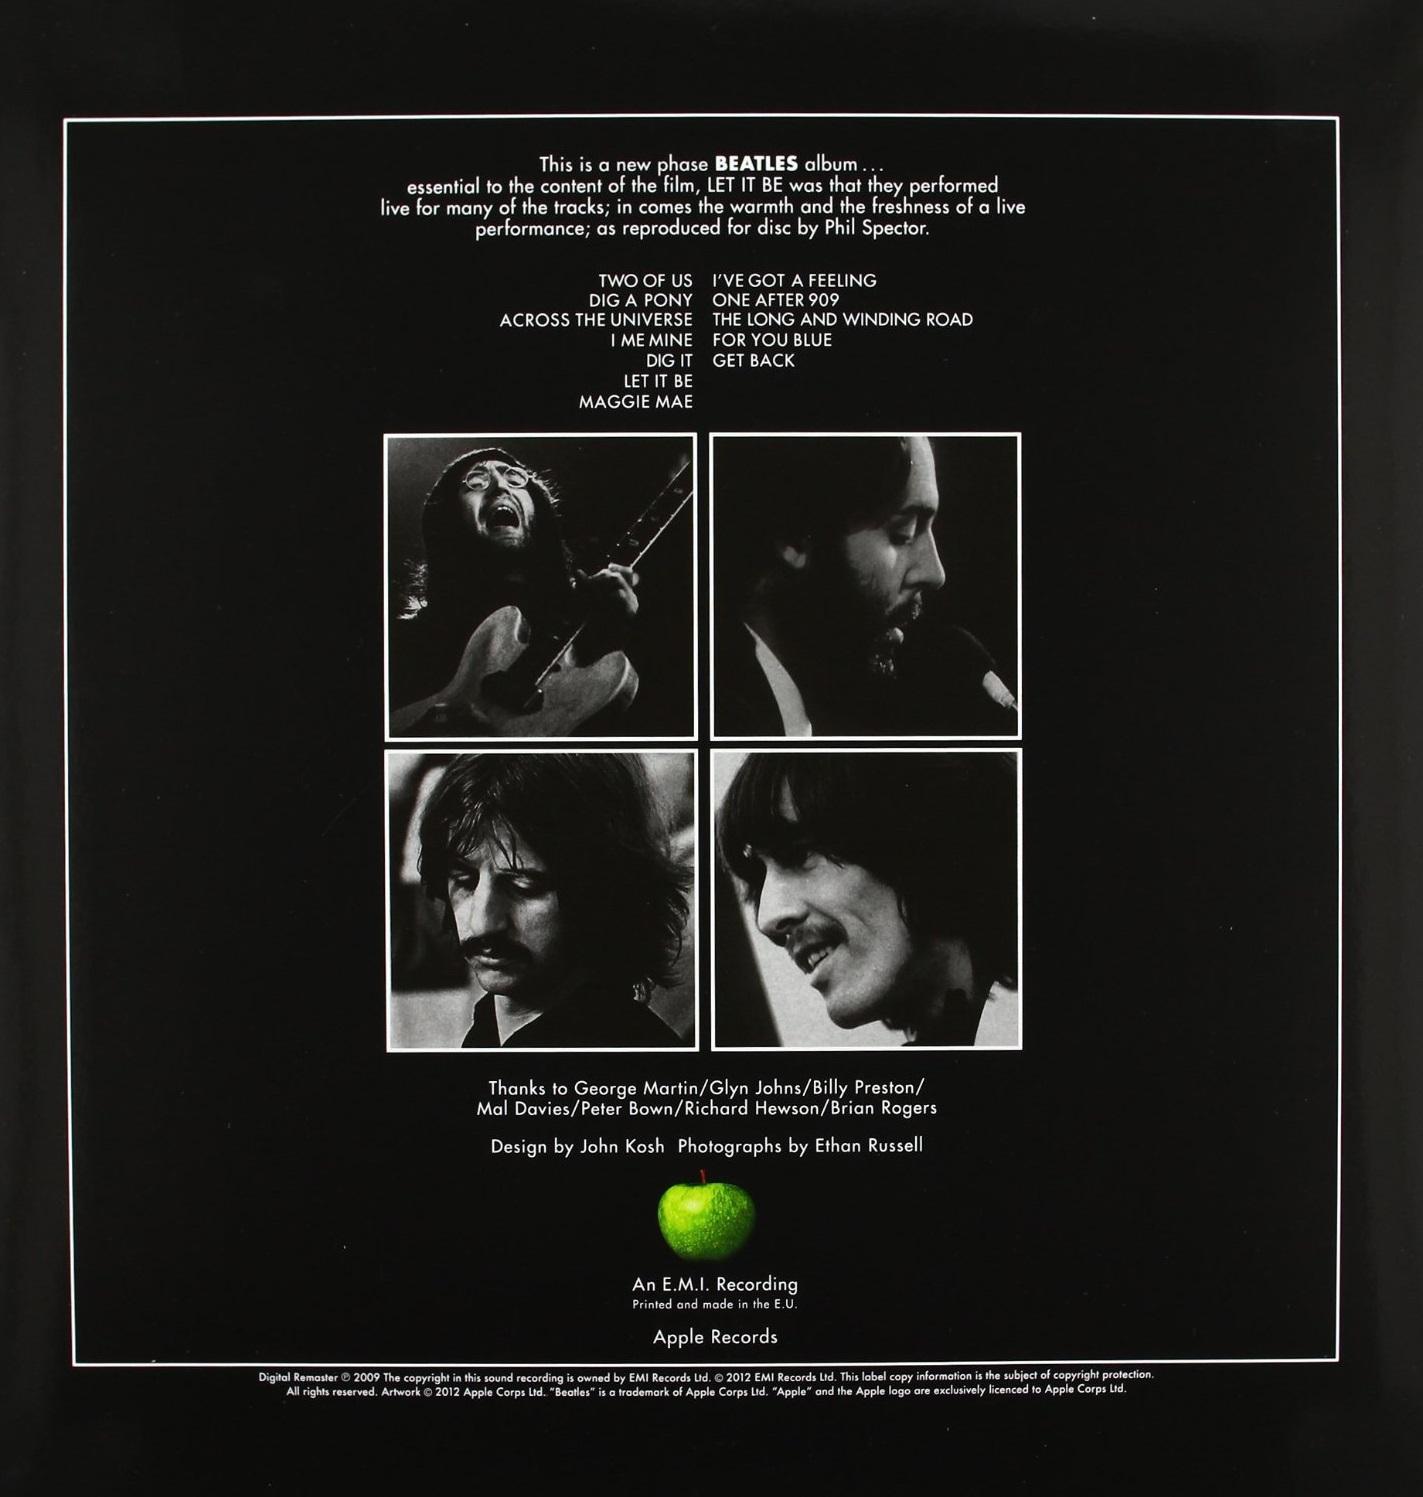 The Beatles Quot Let It Be Quot купить на виниловой пластинке